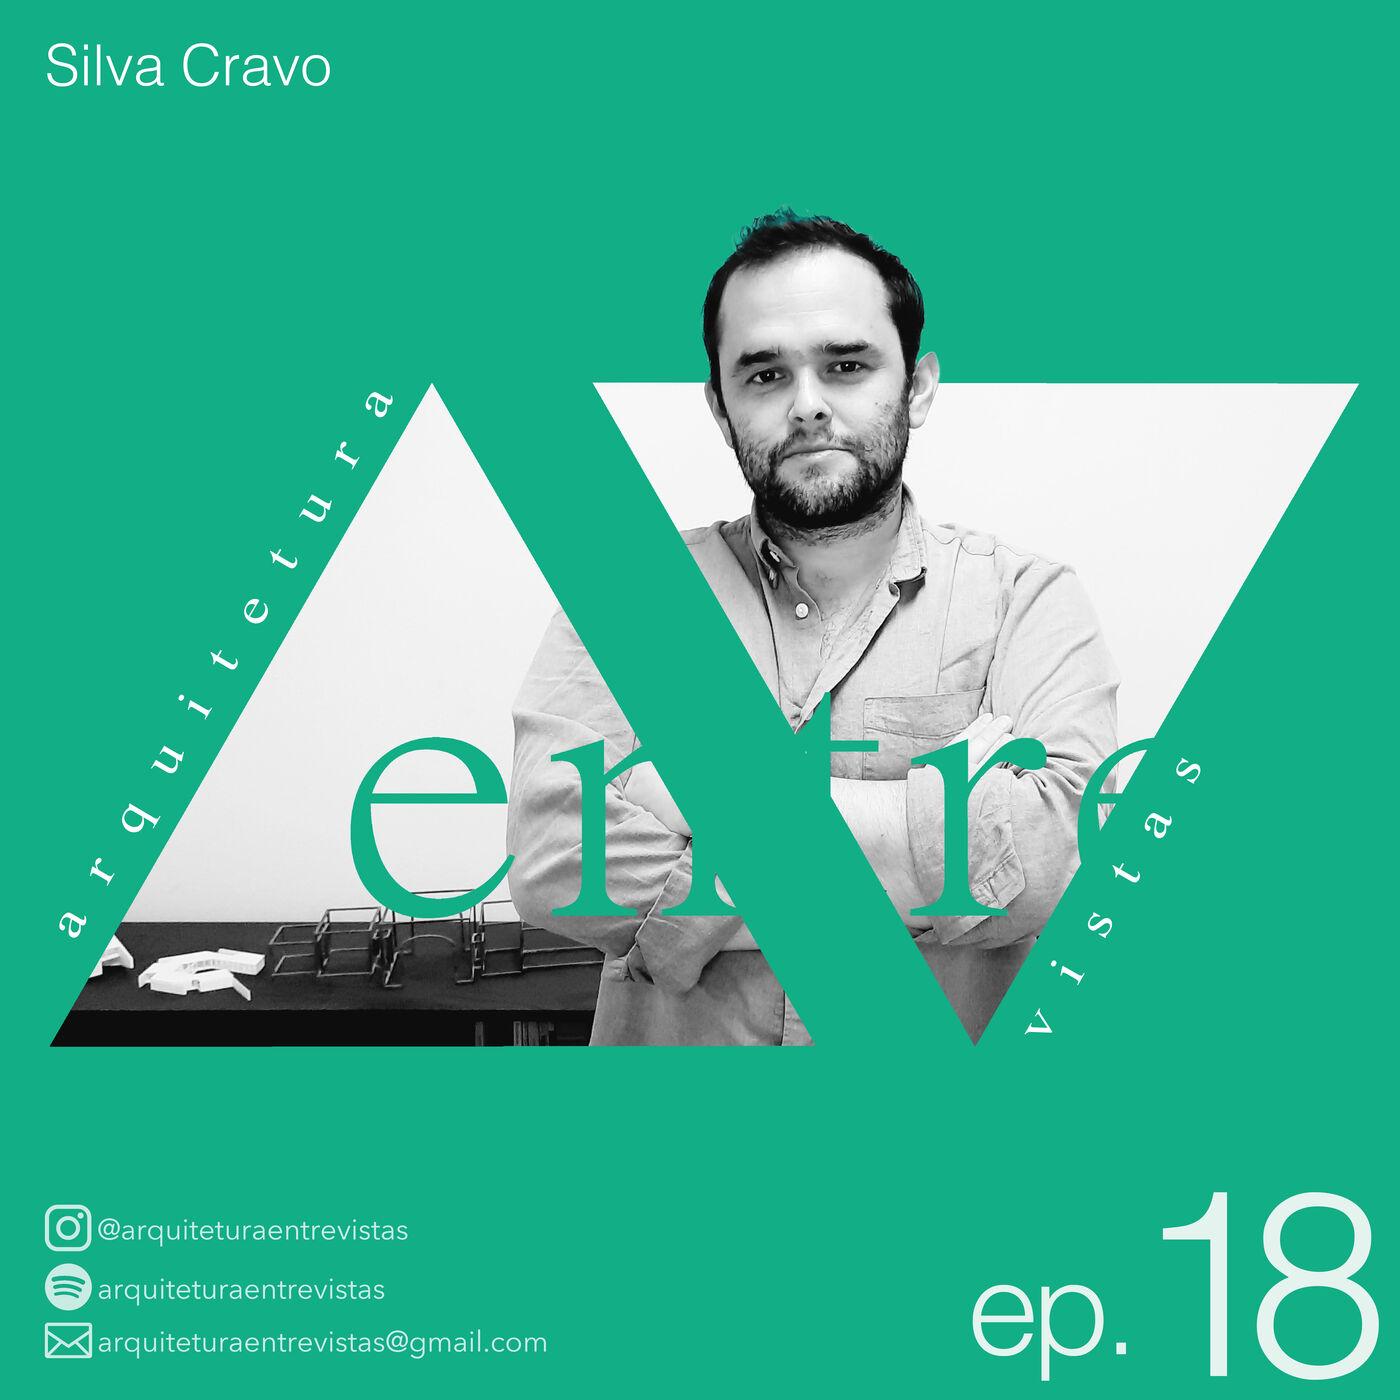 EP.18 Silva Cravo, Arquitetura Entre Vistas